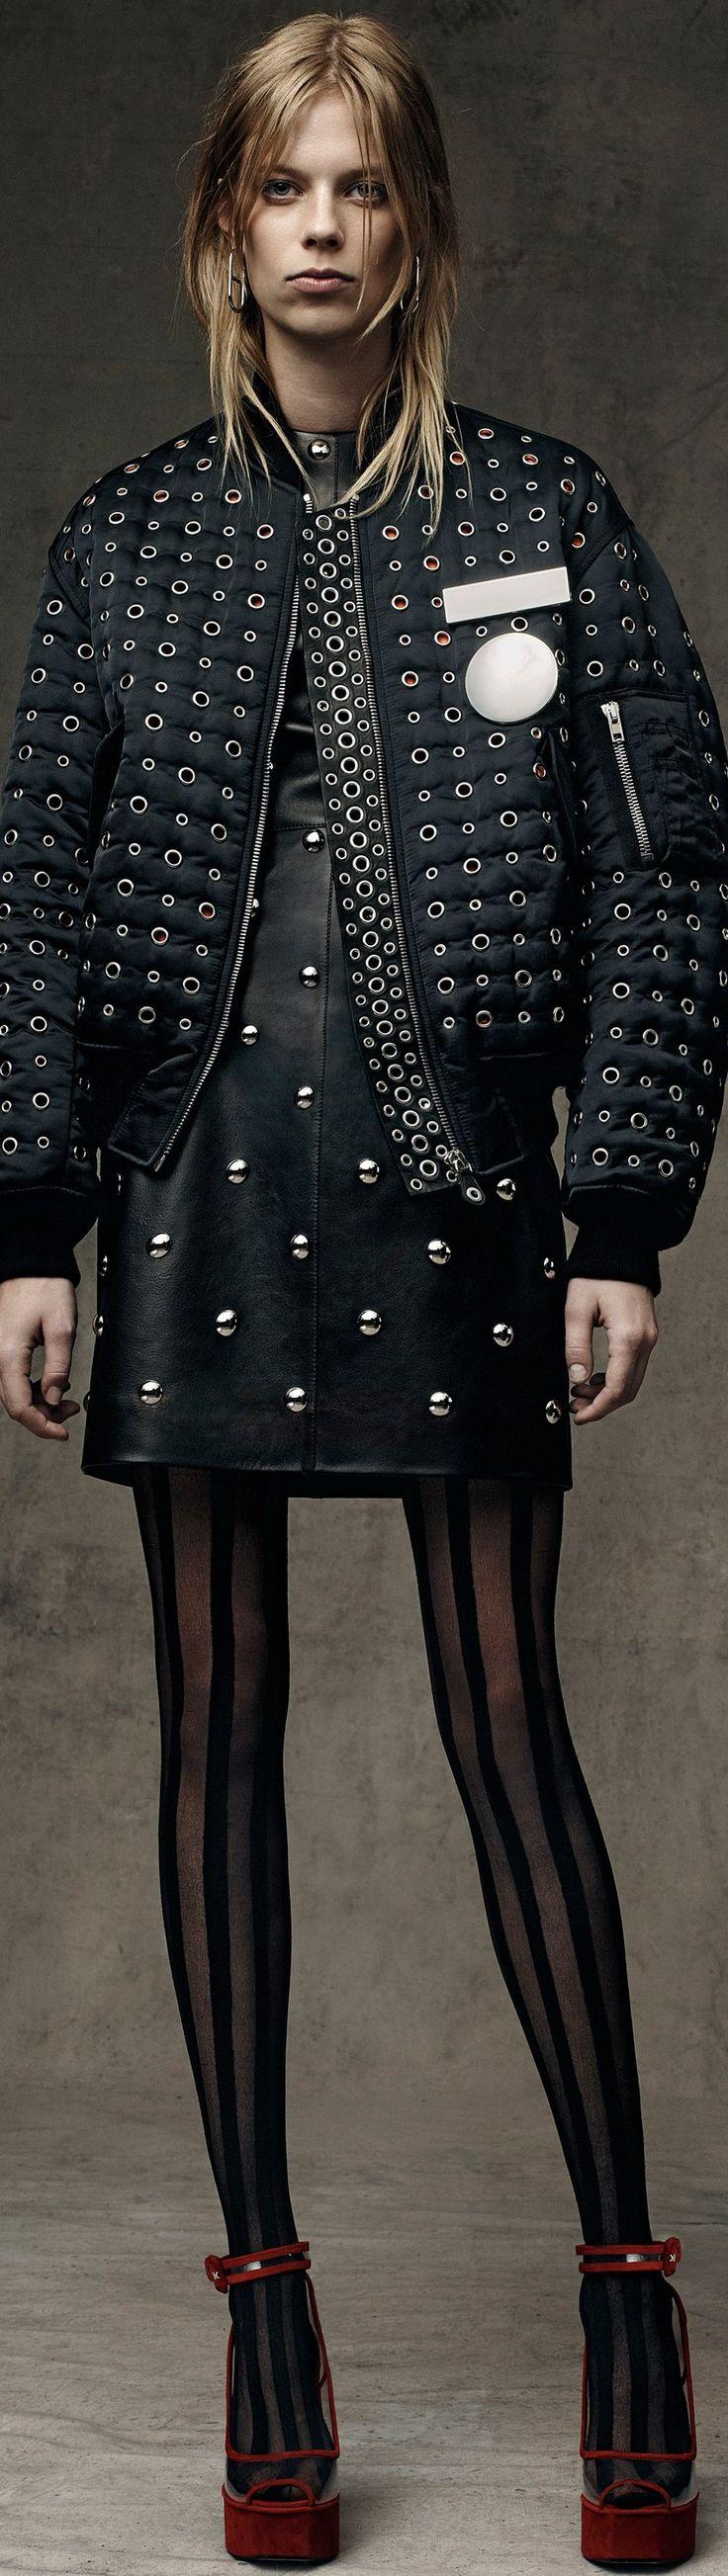 Studs rivets fashion style inspiration